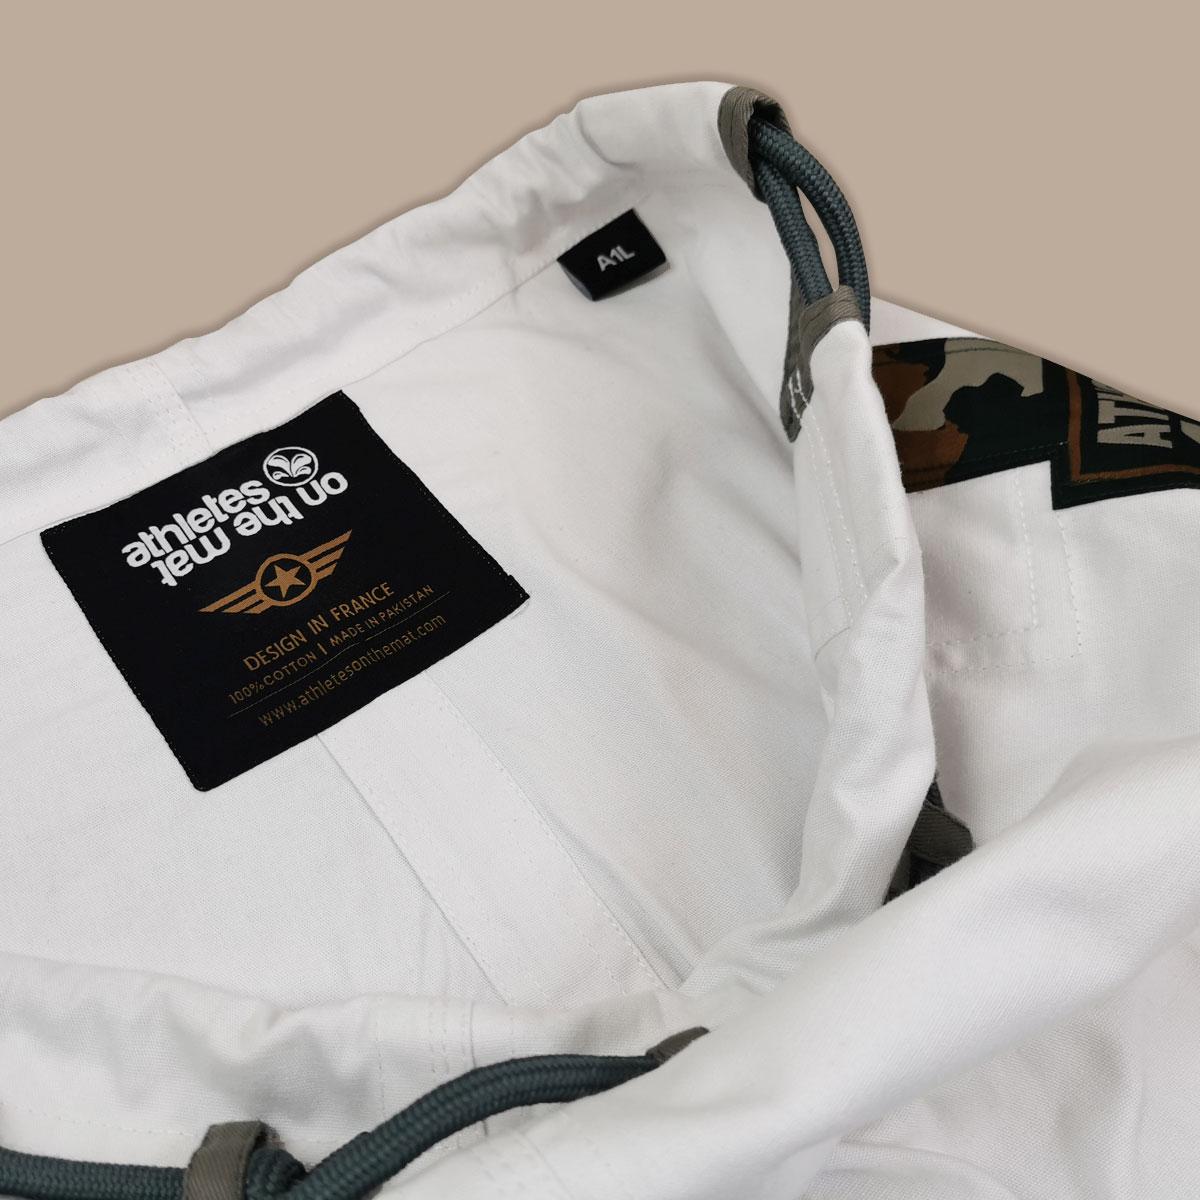 intérieur du pantalon du kimono de JJB Camo